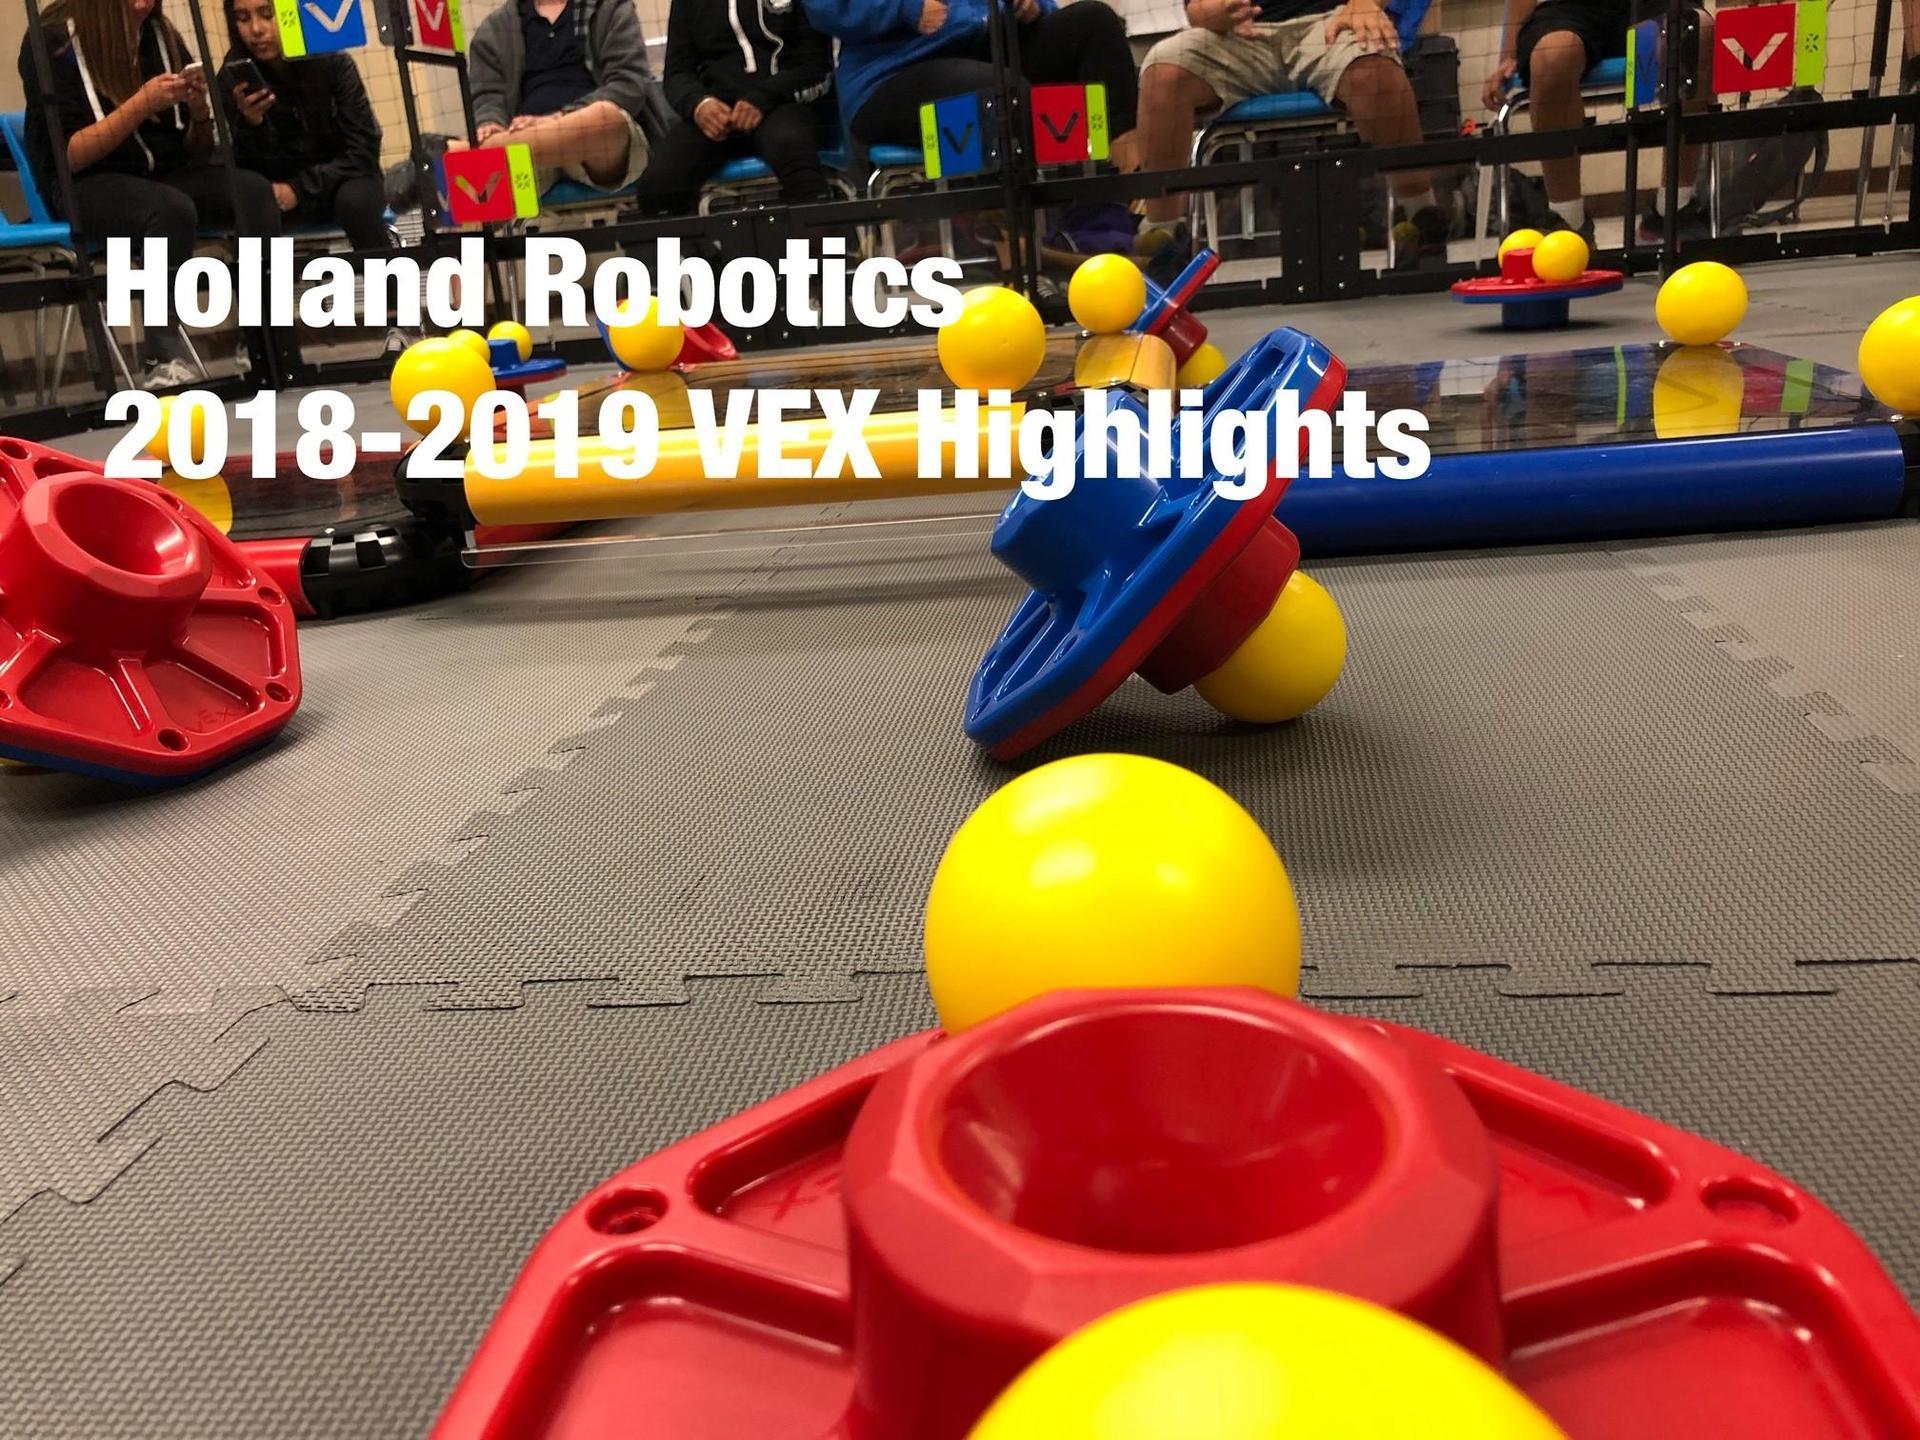 highlight video image